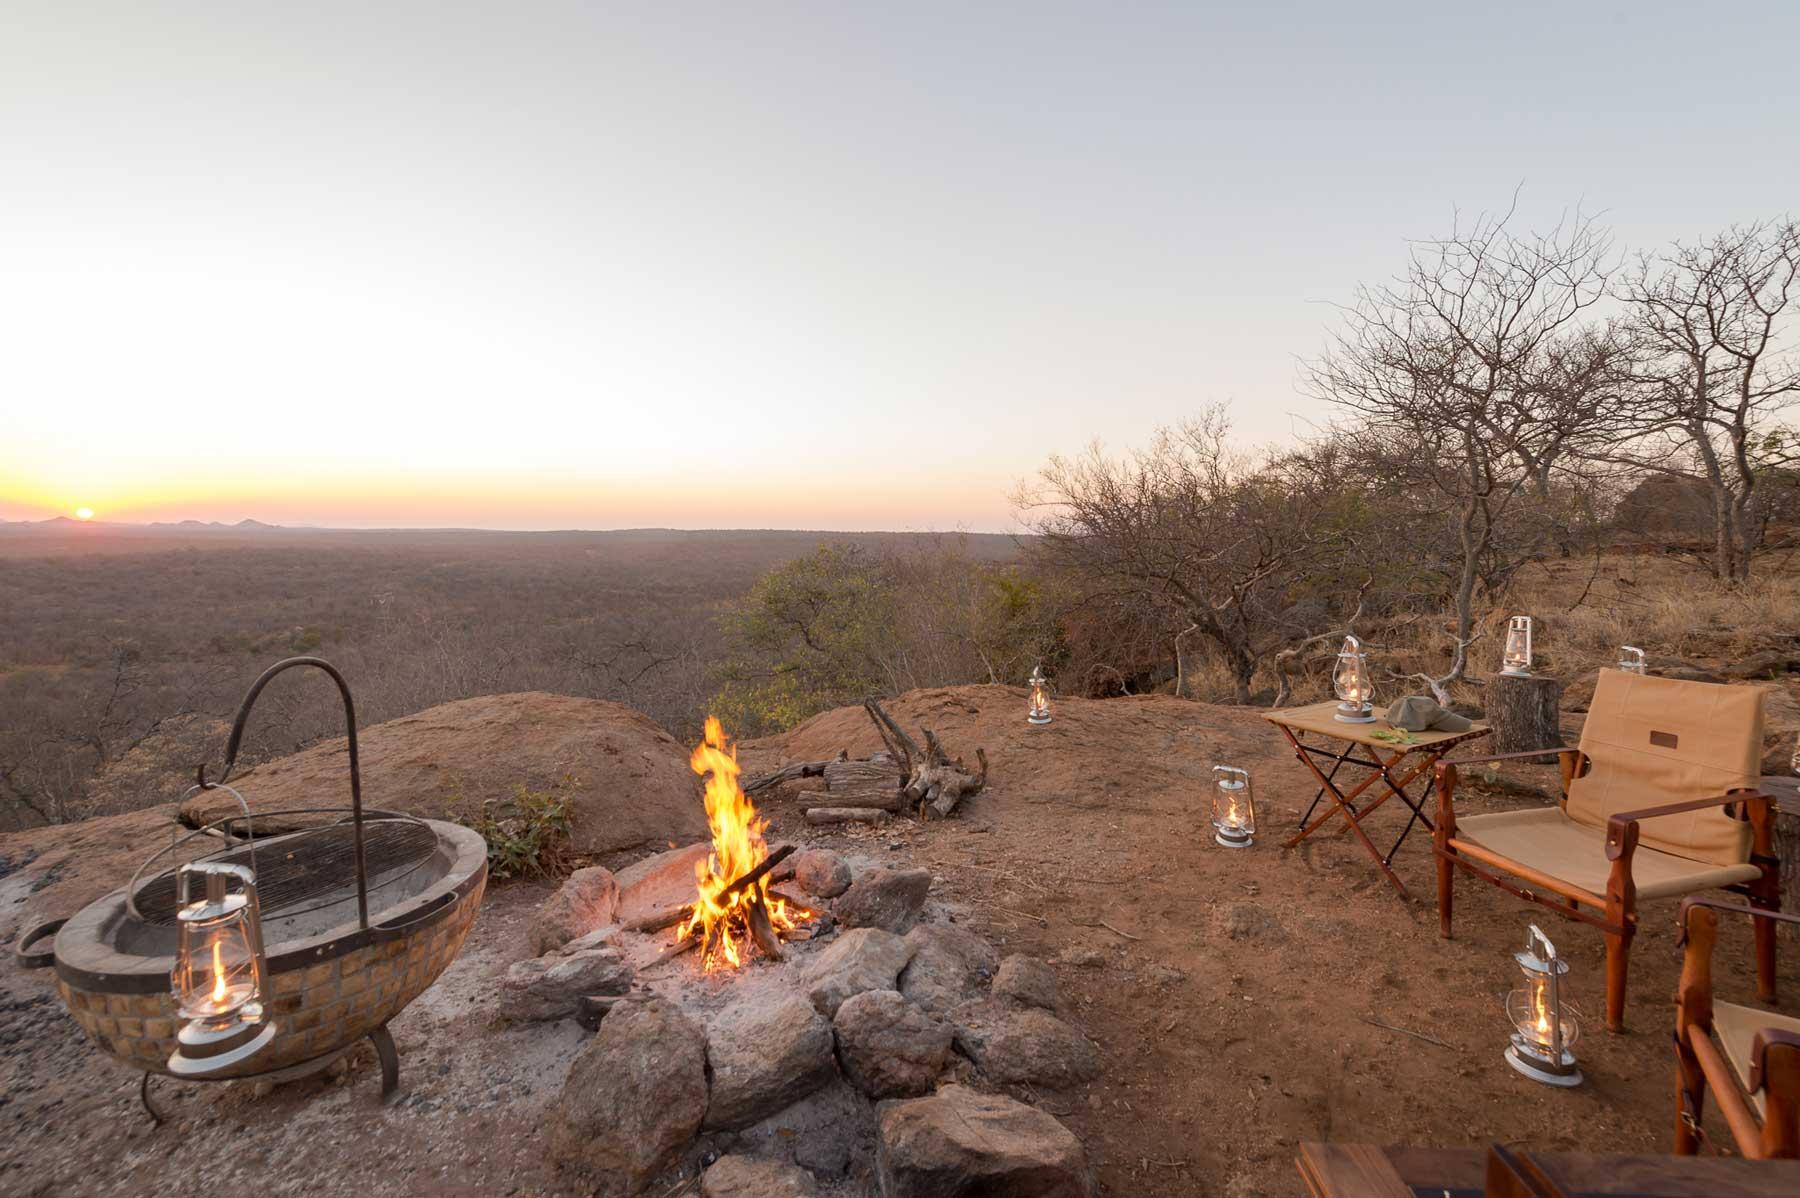 Sundowners at Maseke Game Reserve